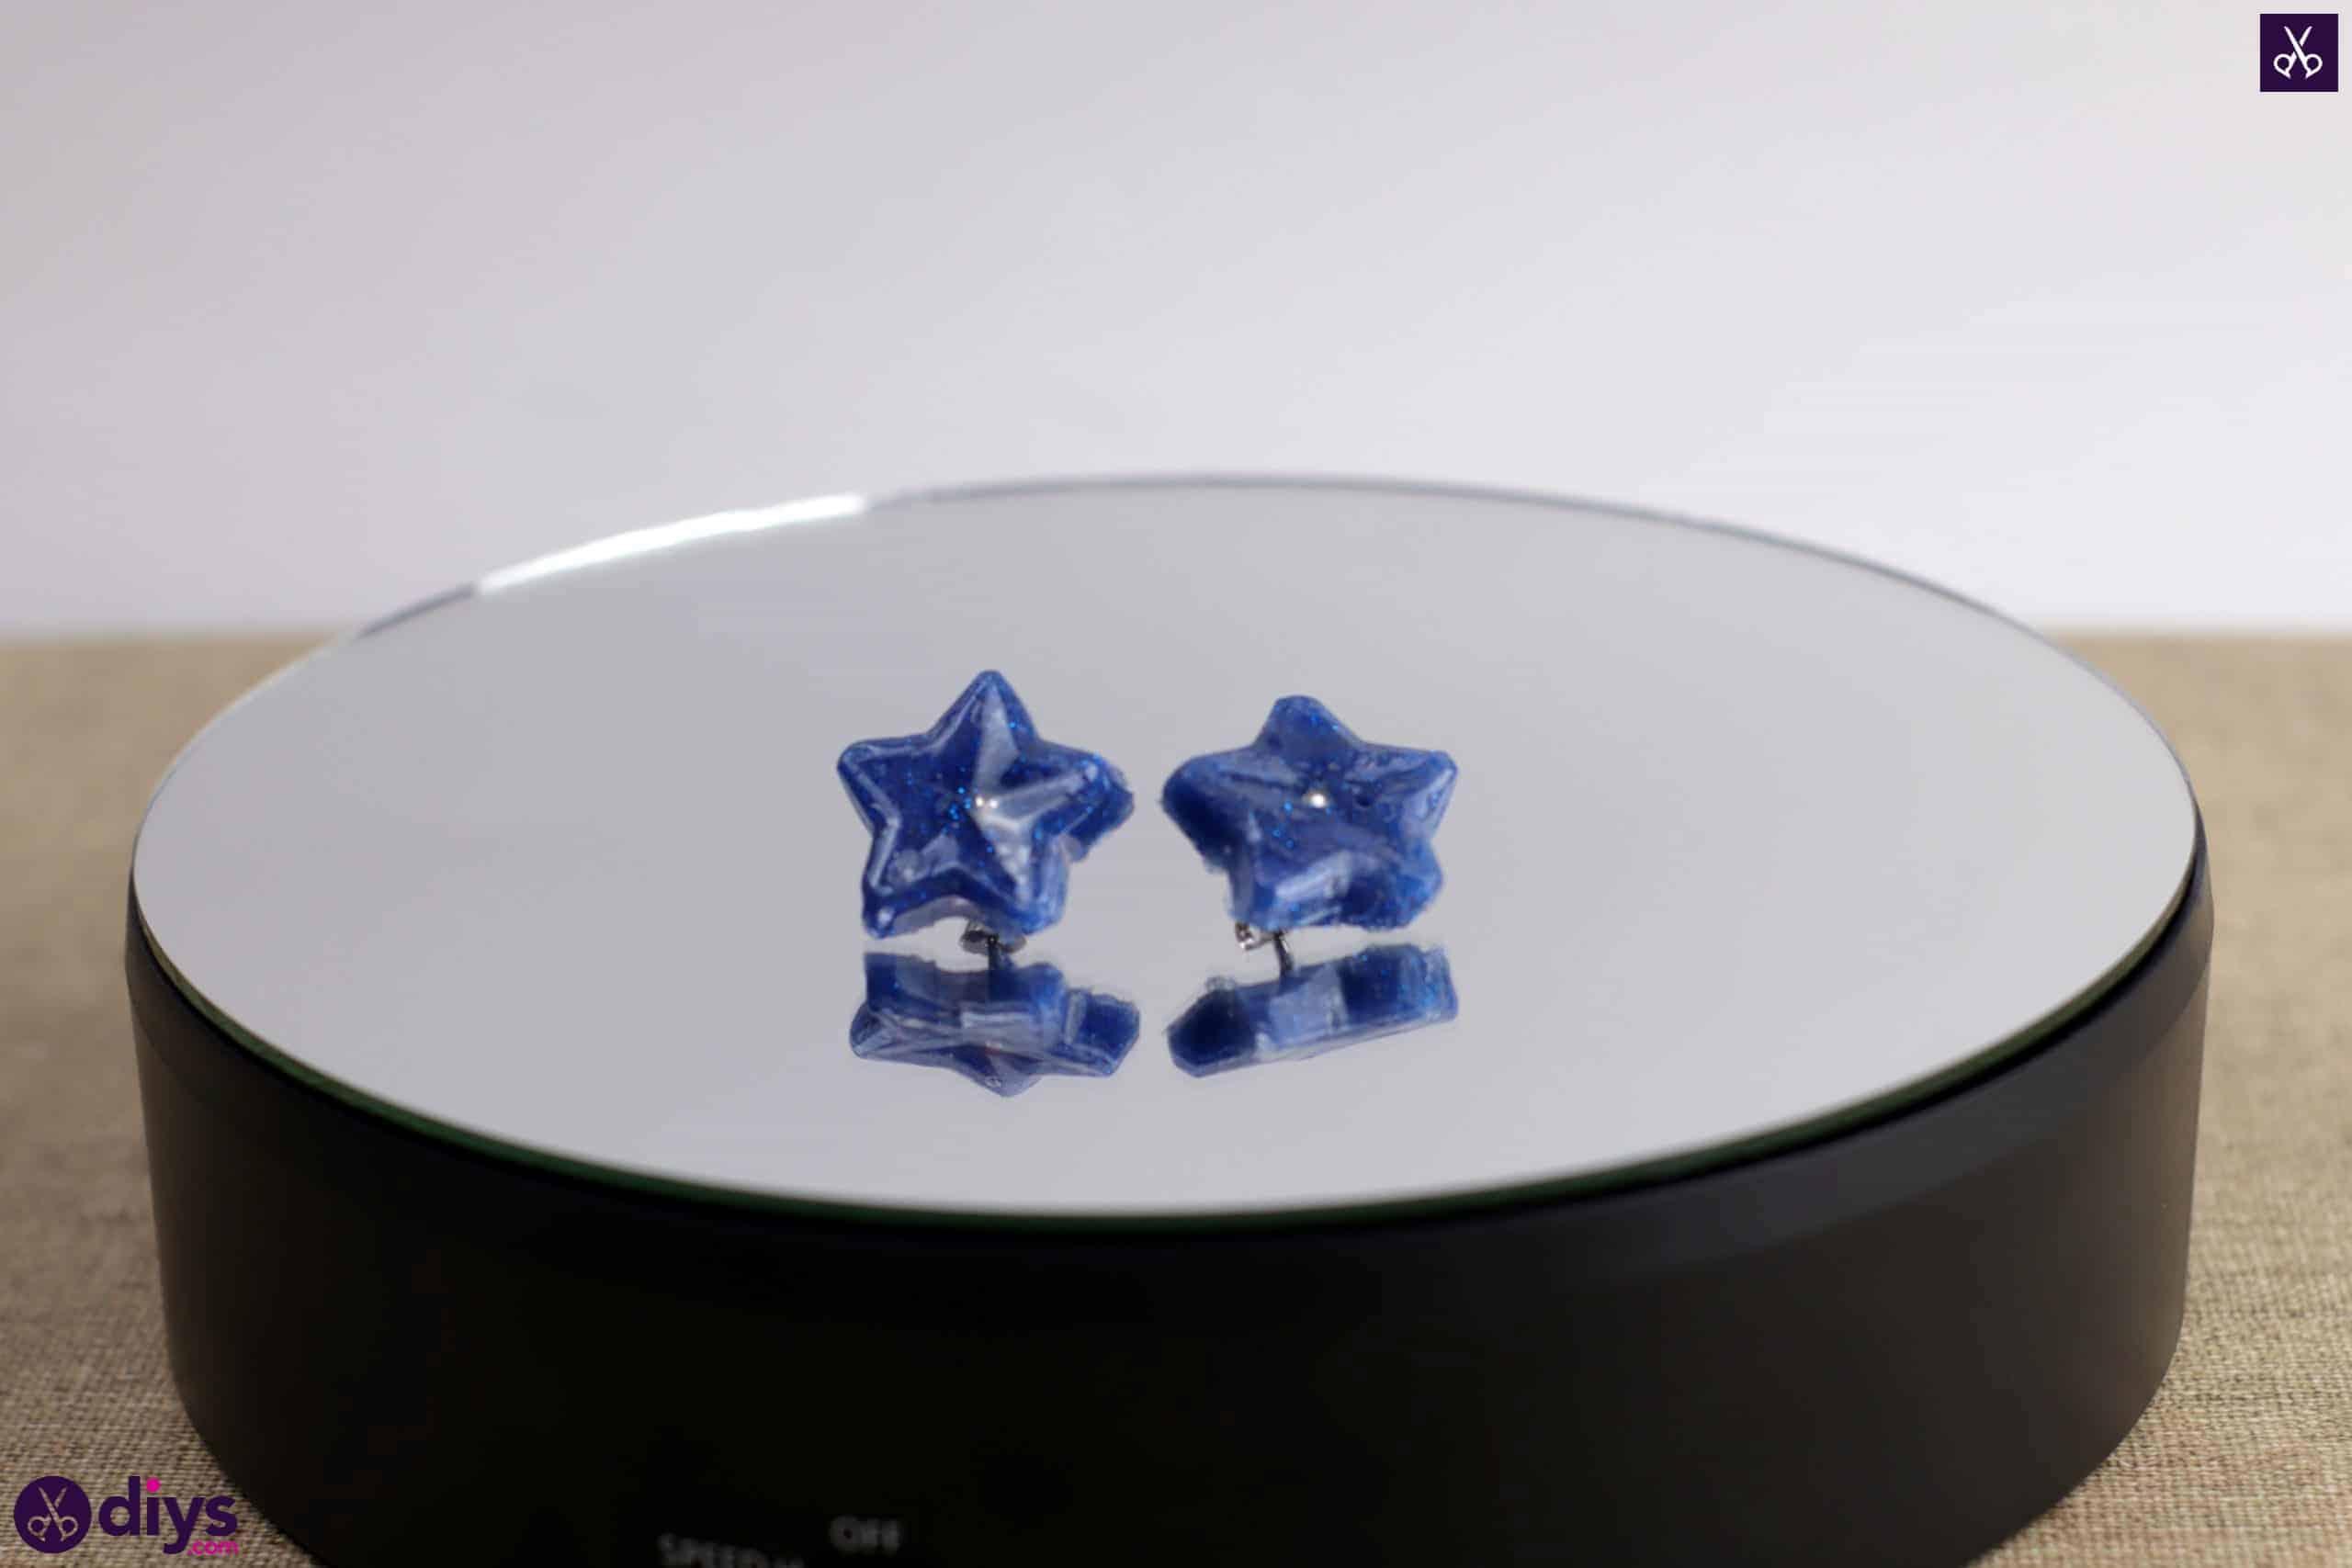 Diy hot glue star earrings